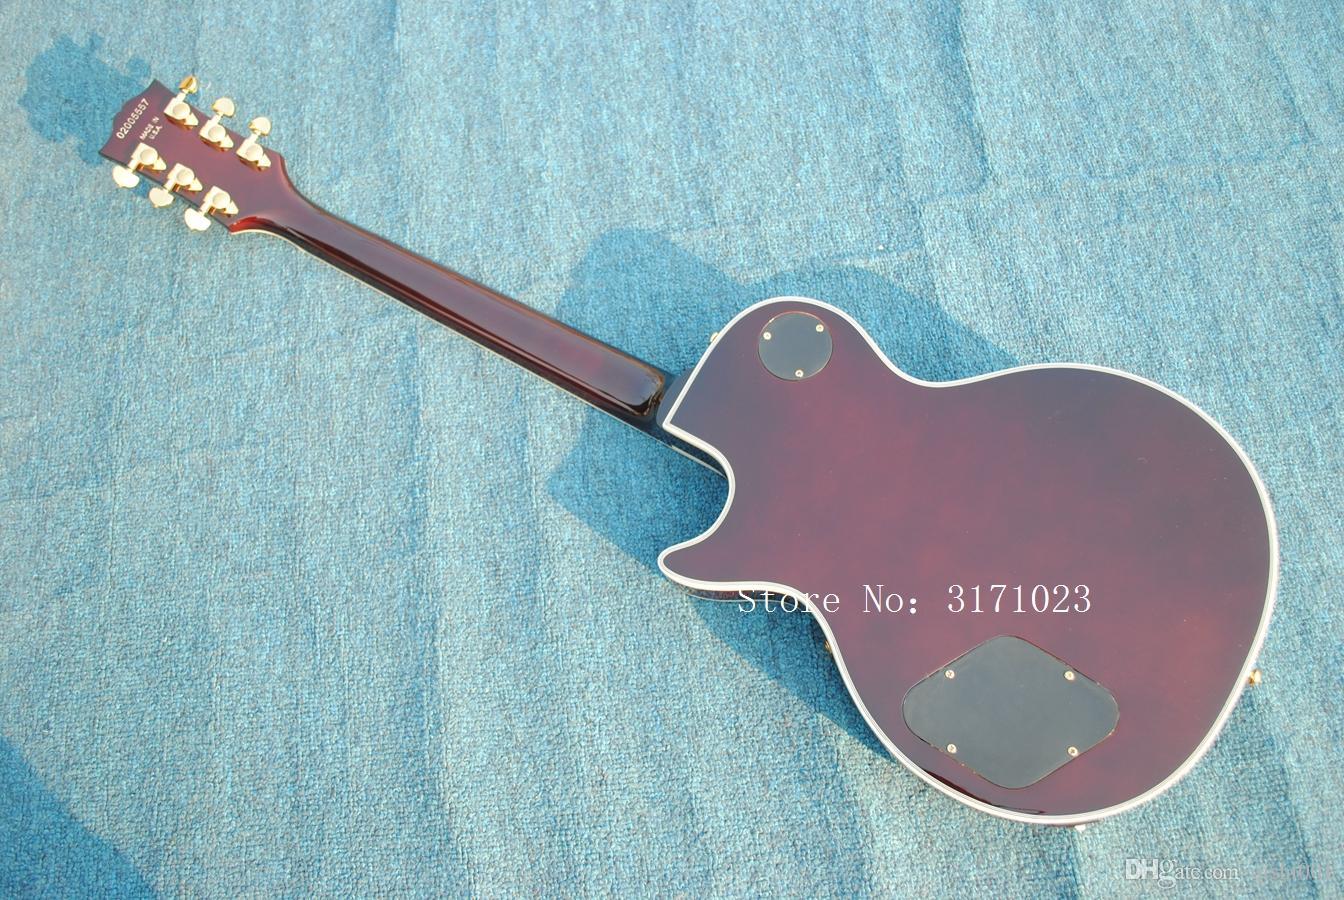 Les fabricants de gros vendent du tabac SunBurst Tiger Flame Top guitare, Custom Chinese Electric guitars